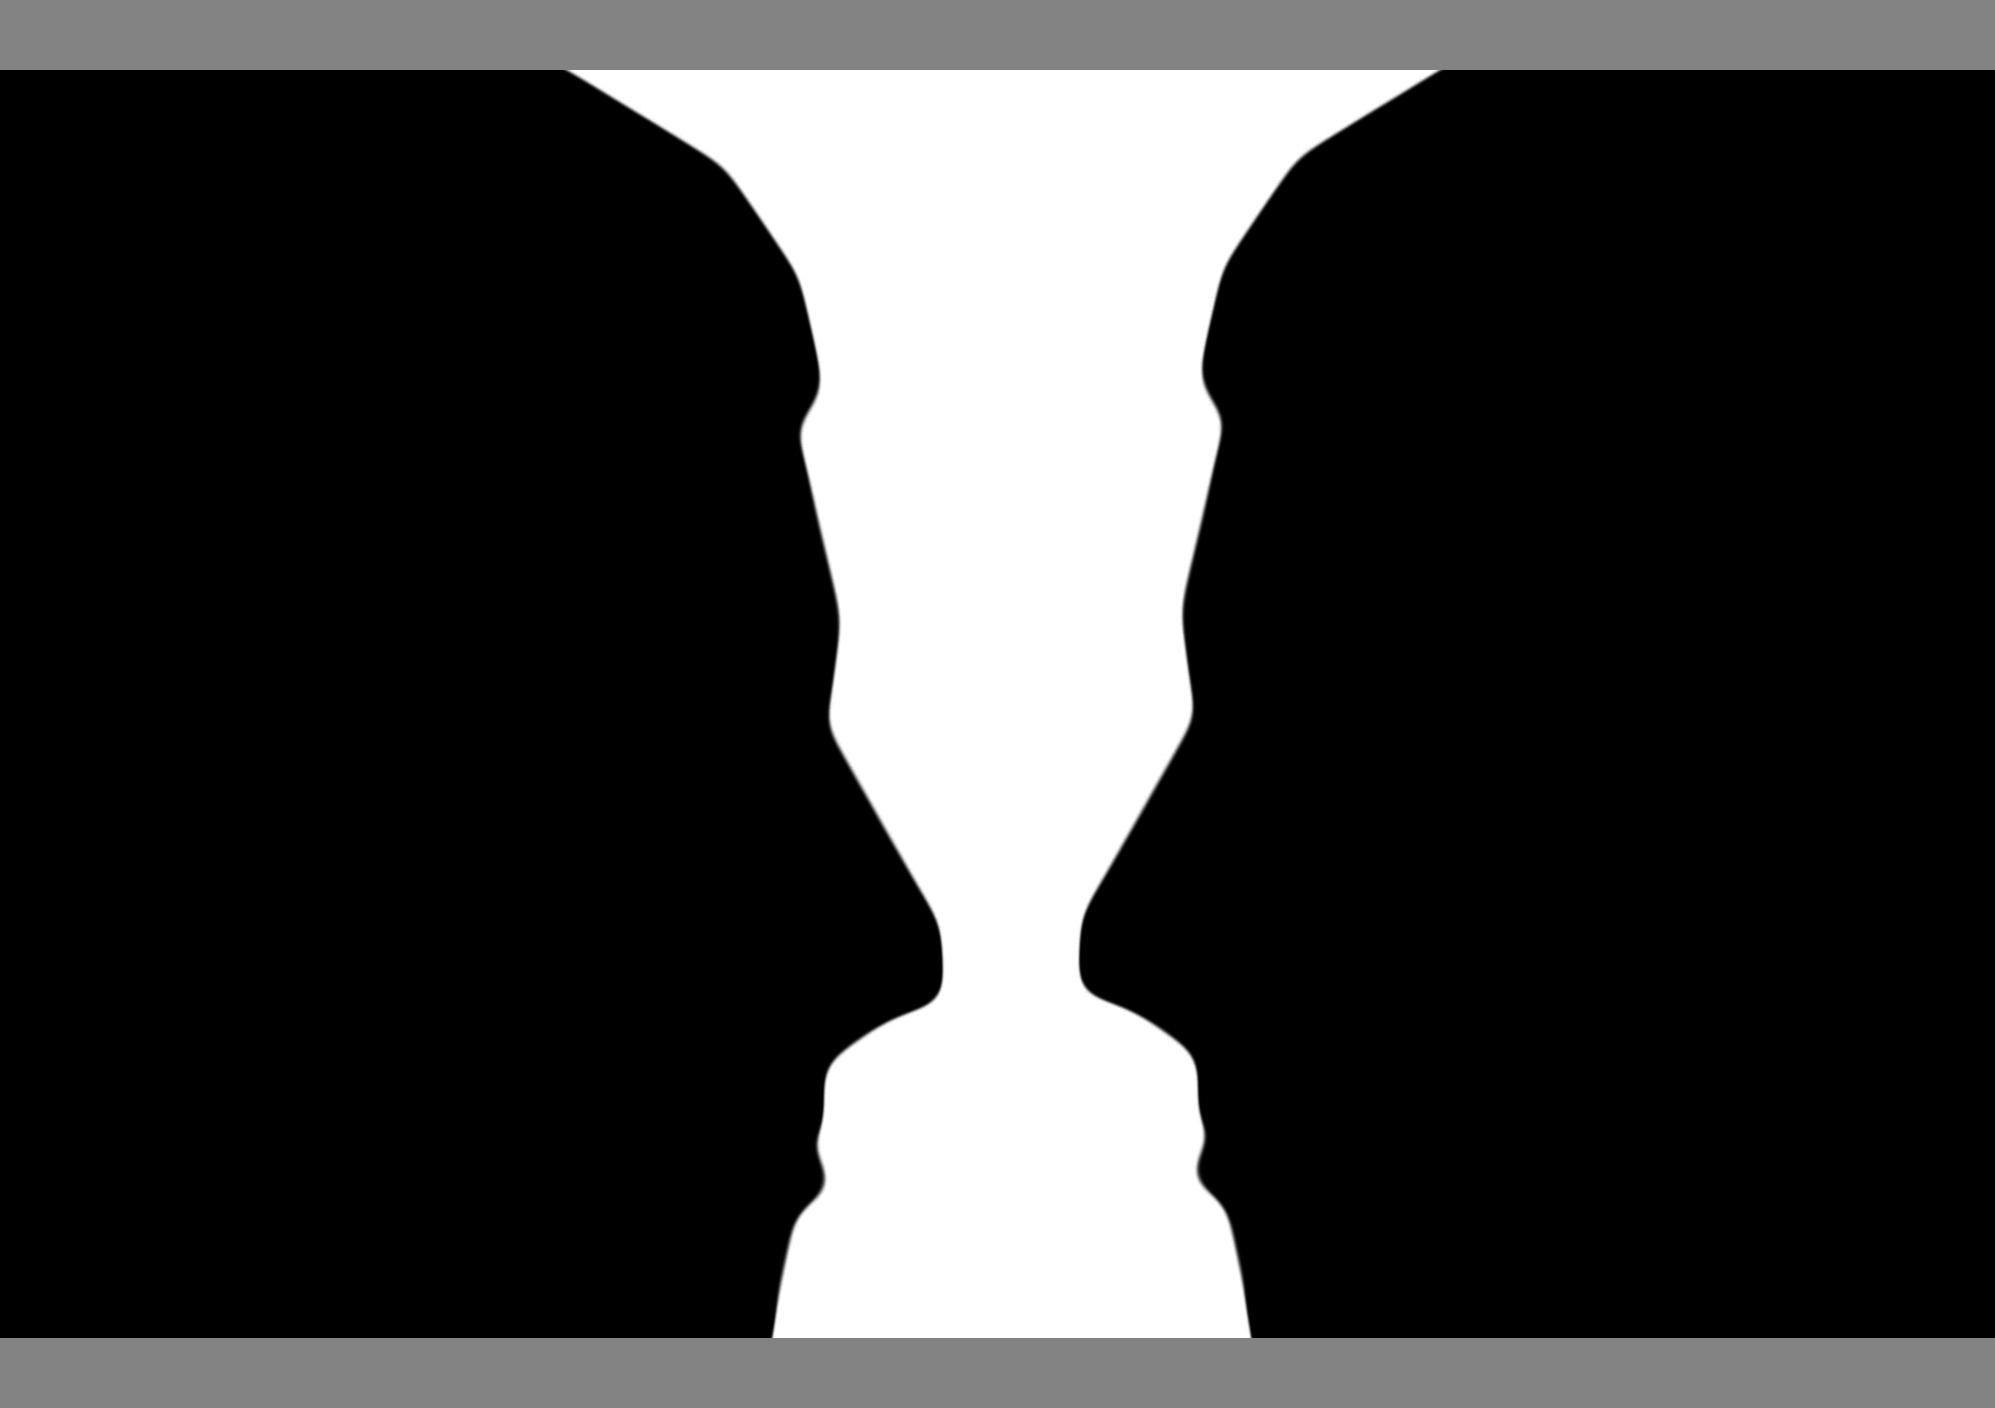 Drawn vase optical illusion Illusion vase figure ground or